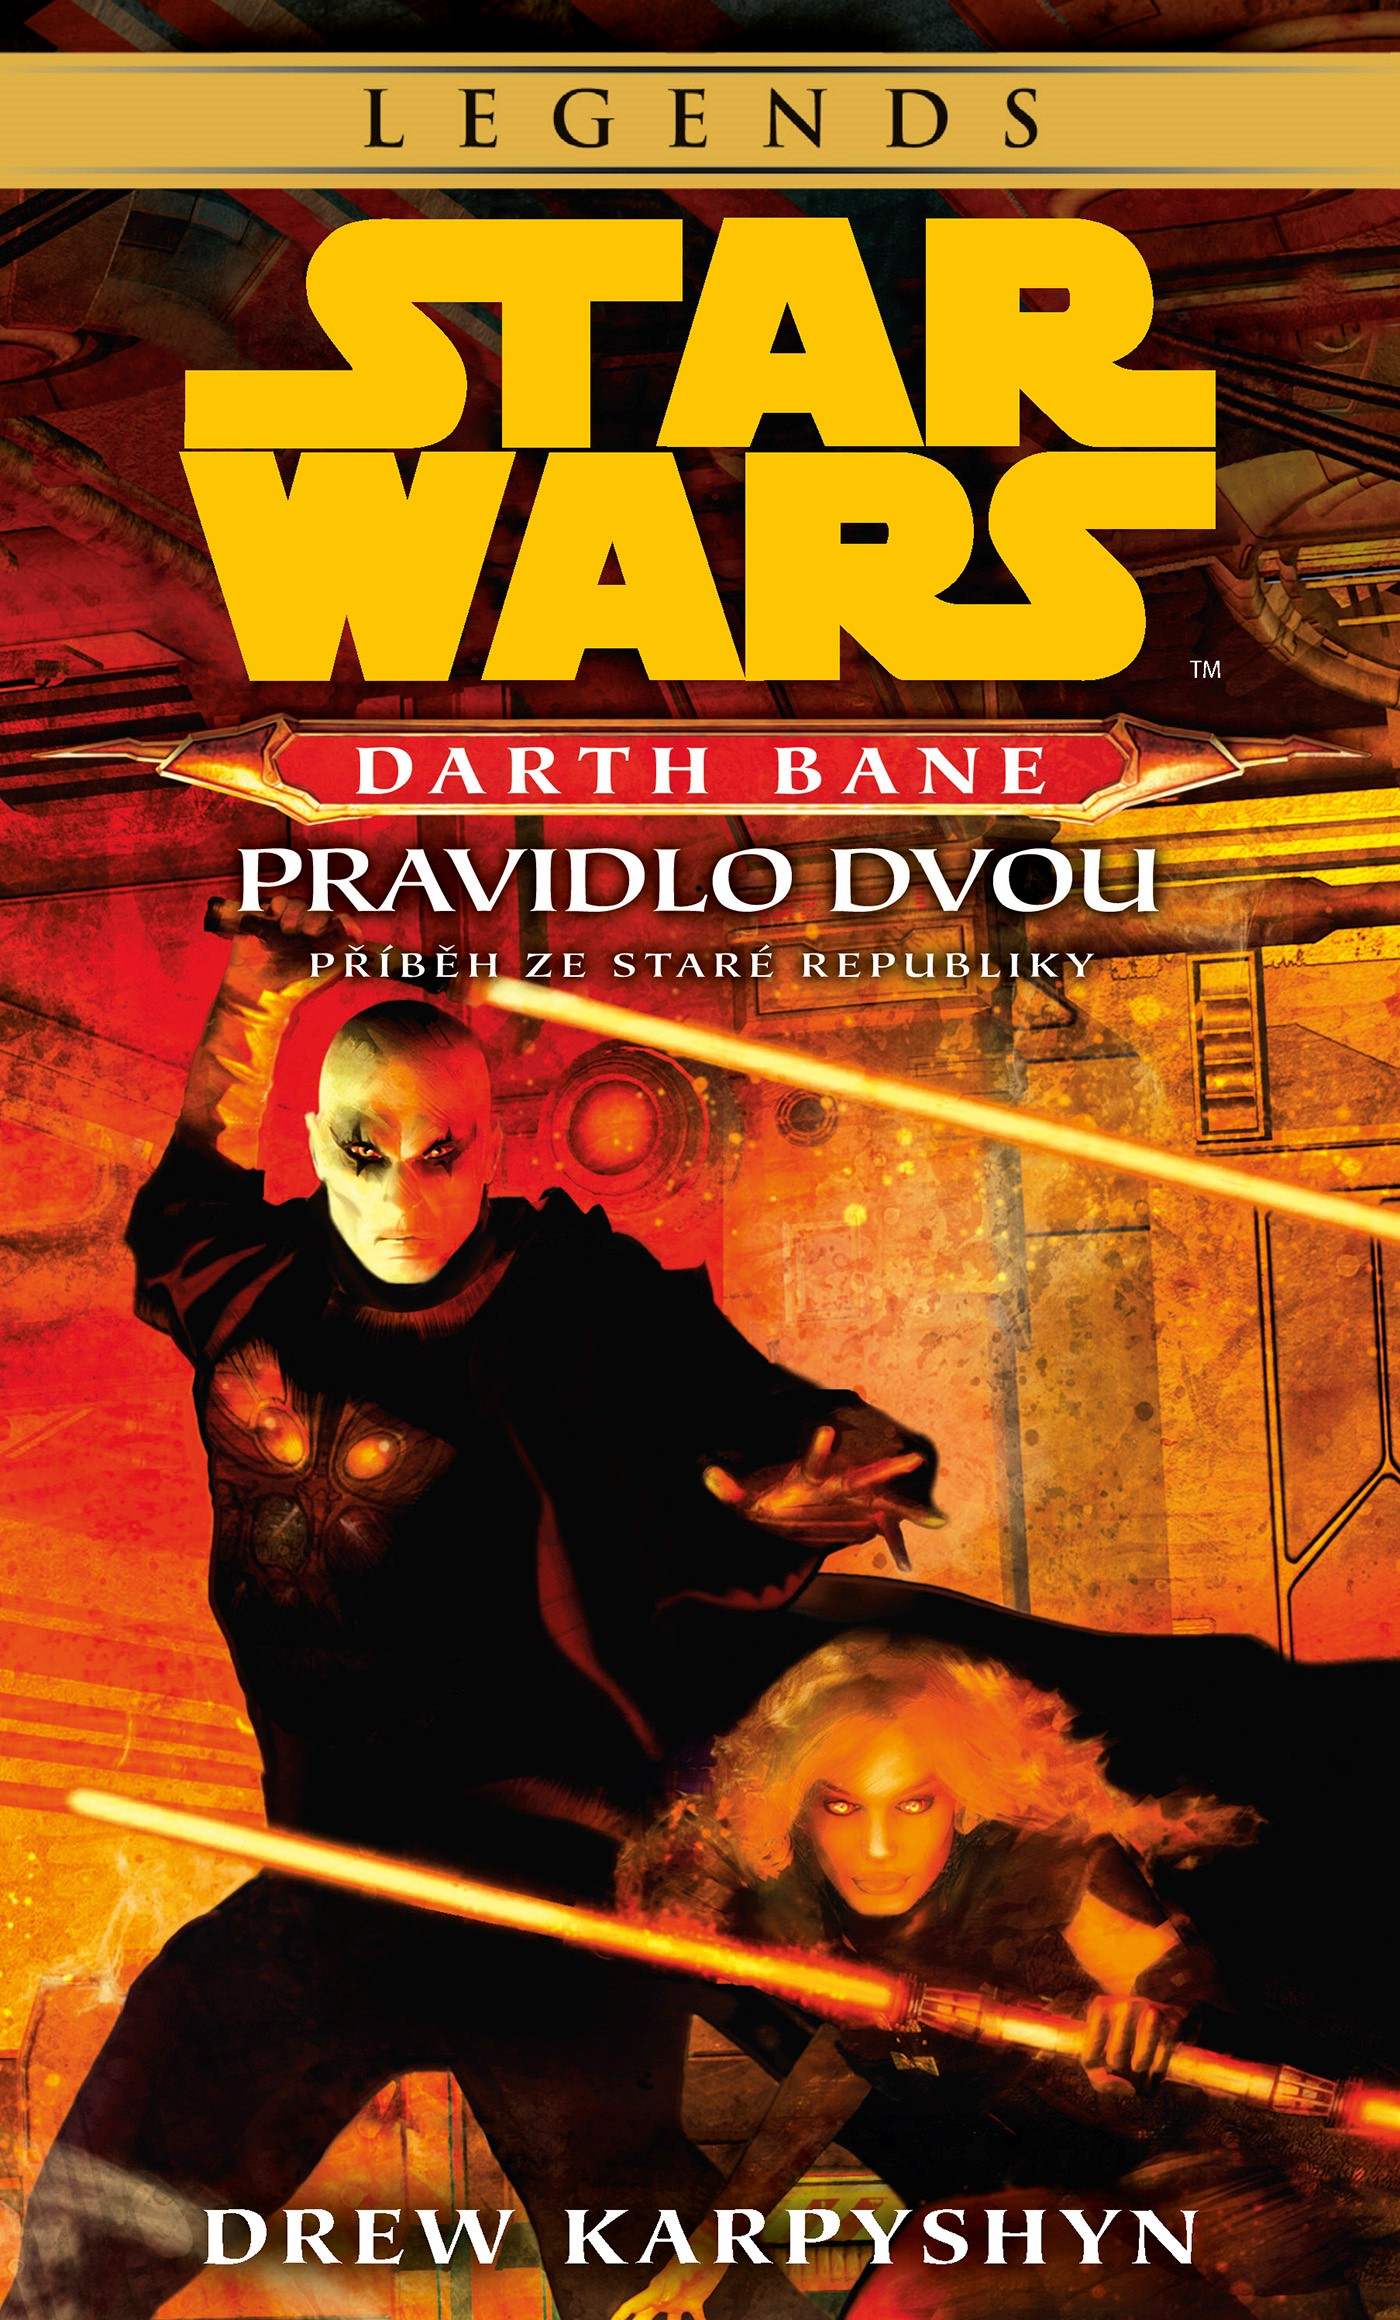 Star Wars - Darth Bane 2. Pravidlo dvou